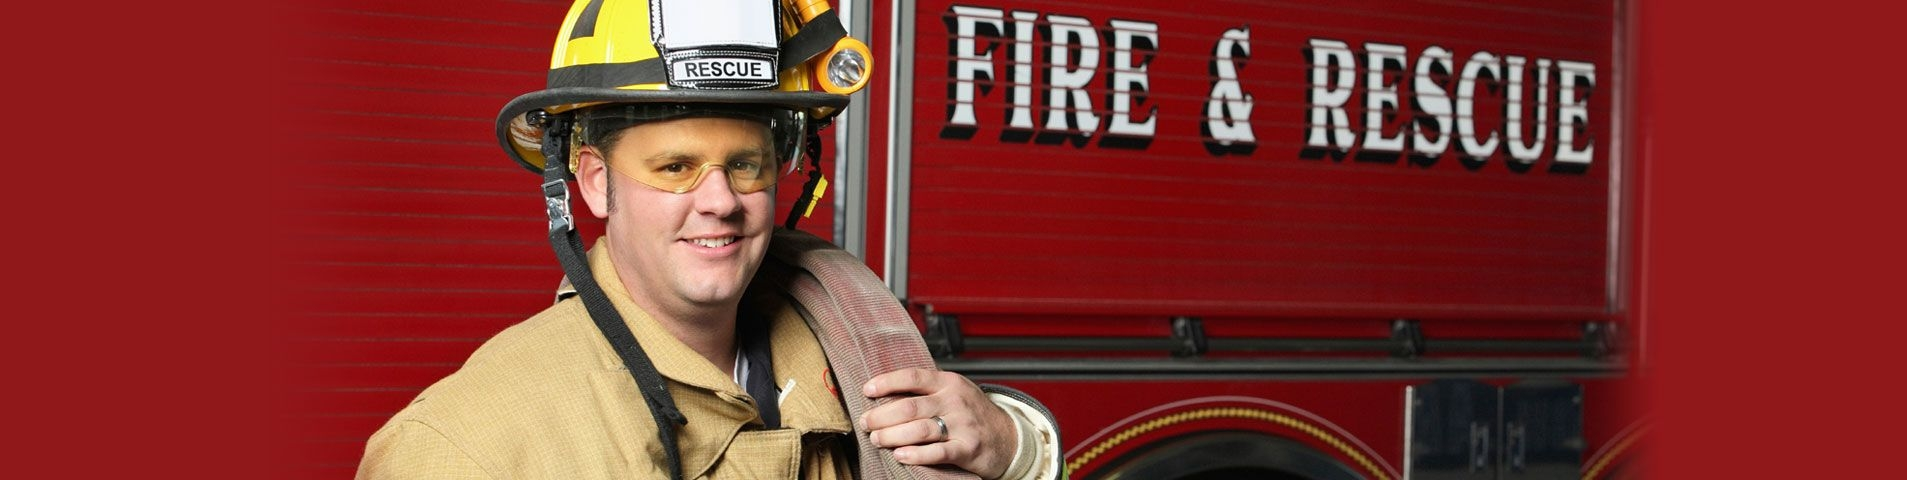 Fire Department Shift Scheduling Software | Snap Schedule